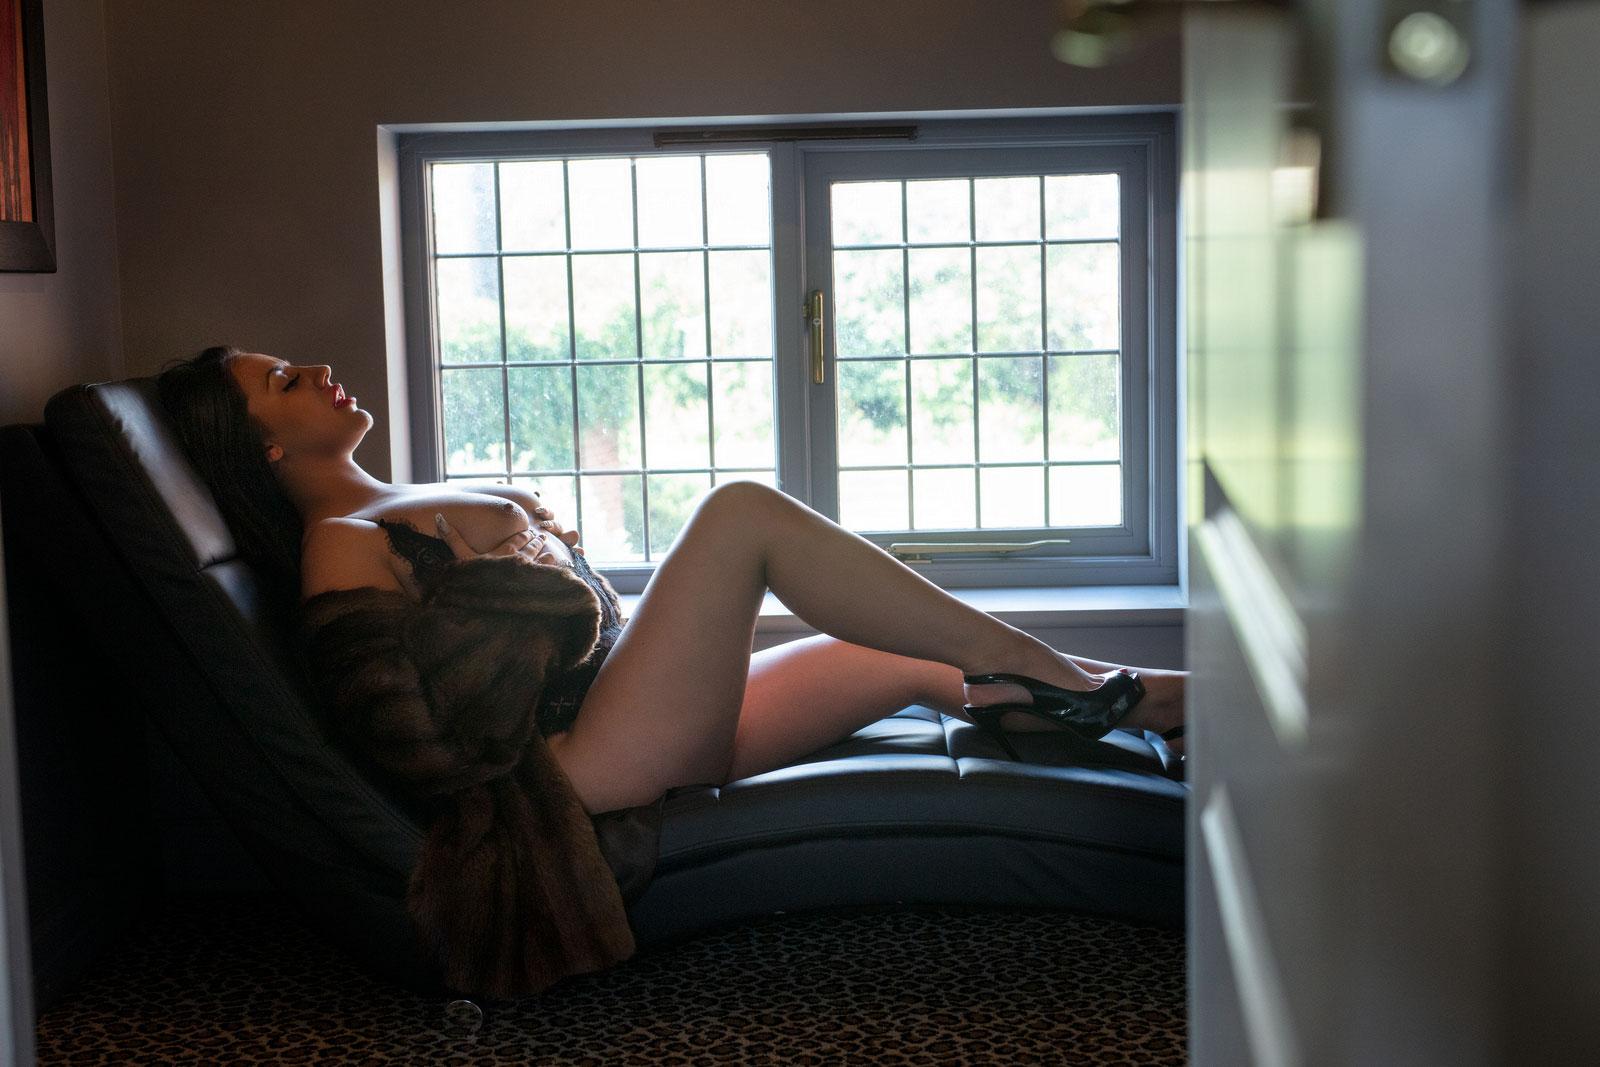 Eritic lady lay on chair near a window